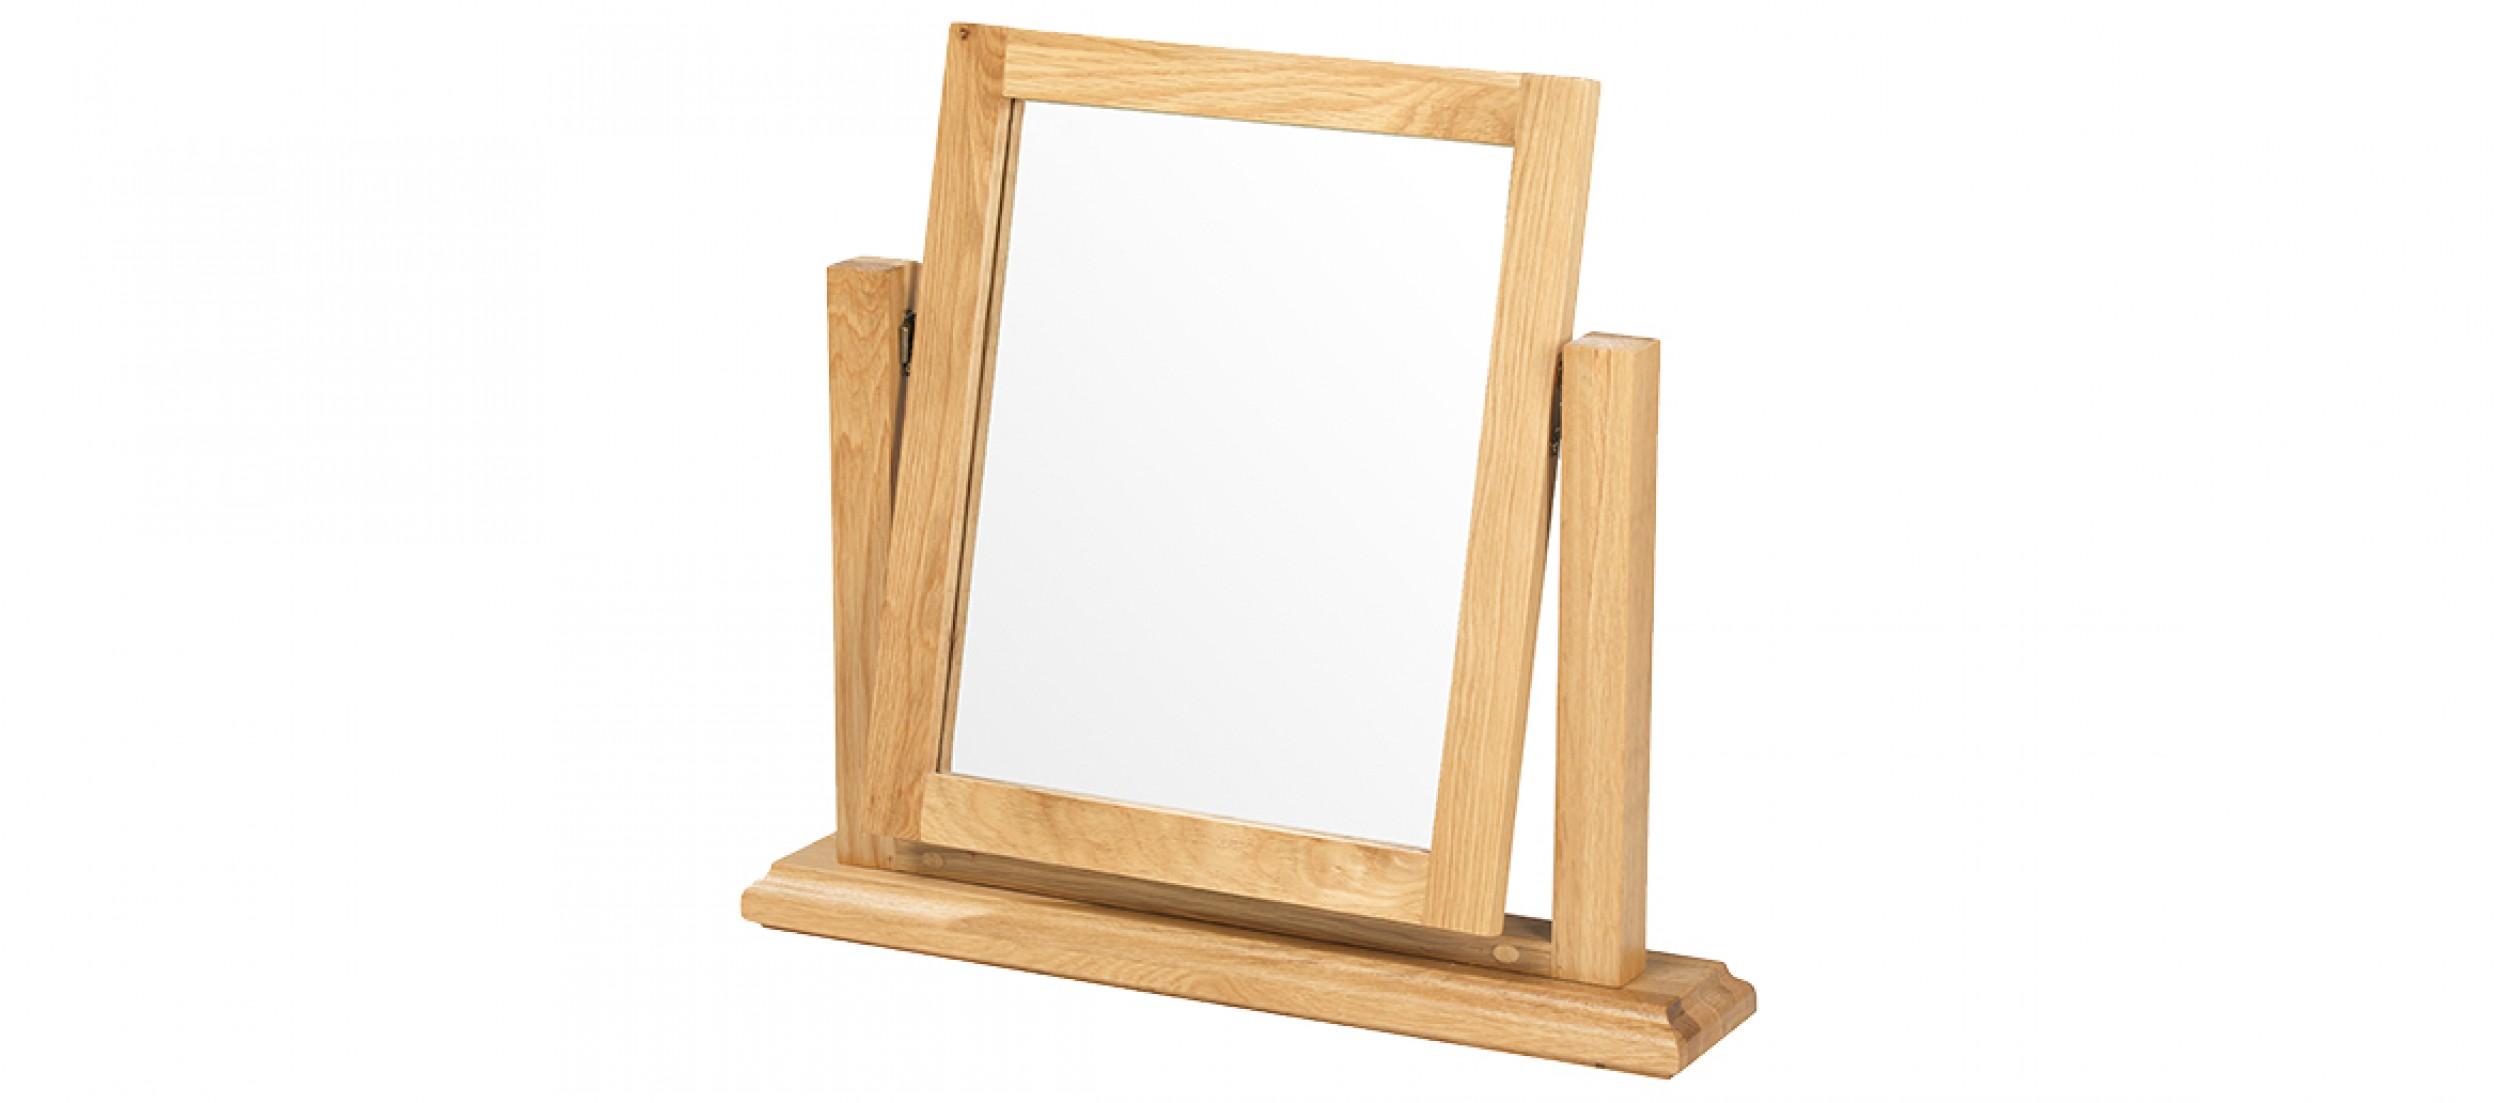 Constance oak dressing table vanity mirror quercus living for Vanity dressing table with mirror